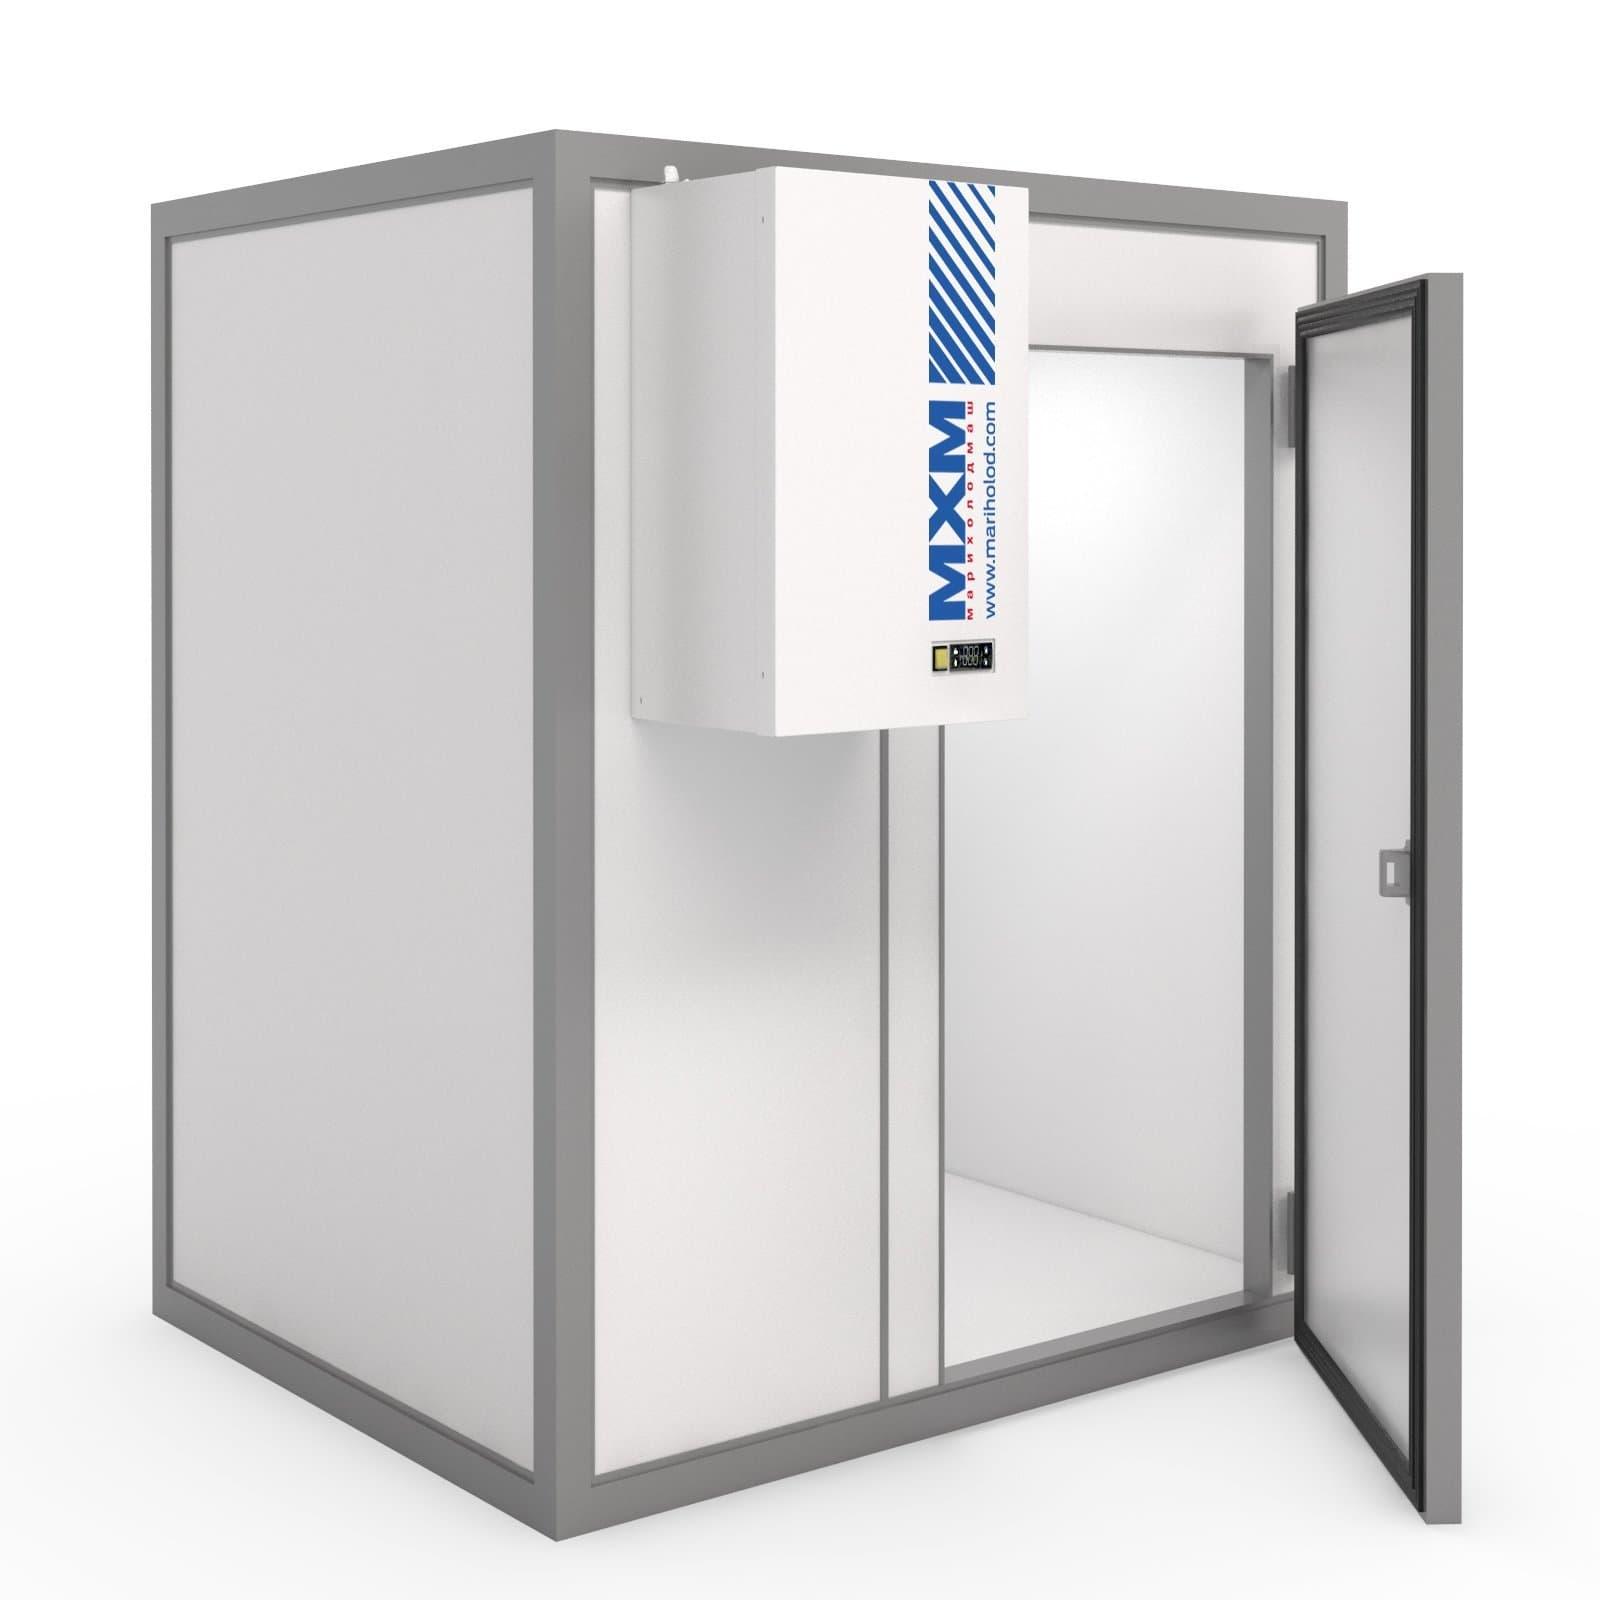 Камера холодильная МХМ КХН-16,16 1360×6760×2200